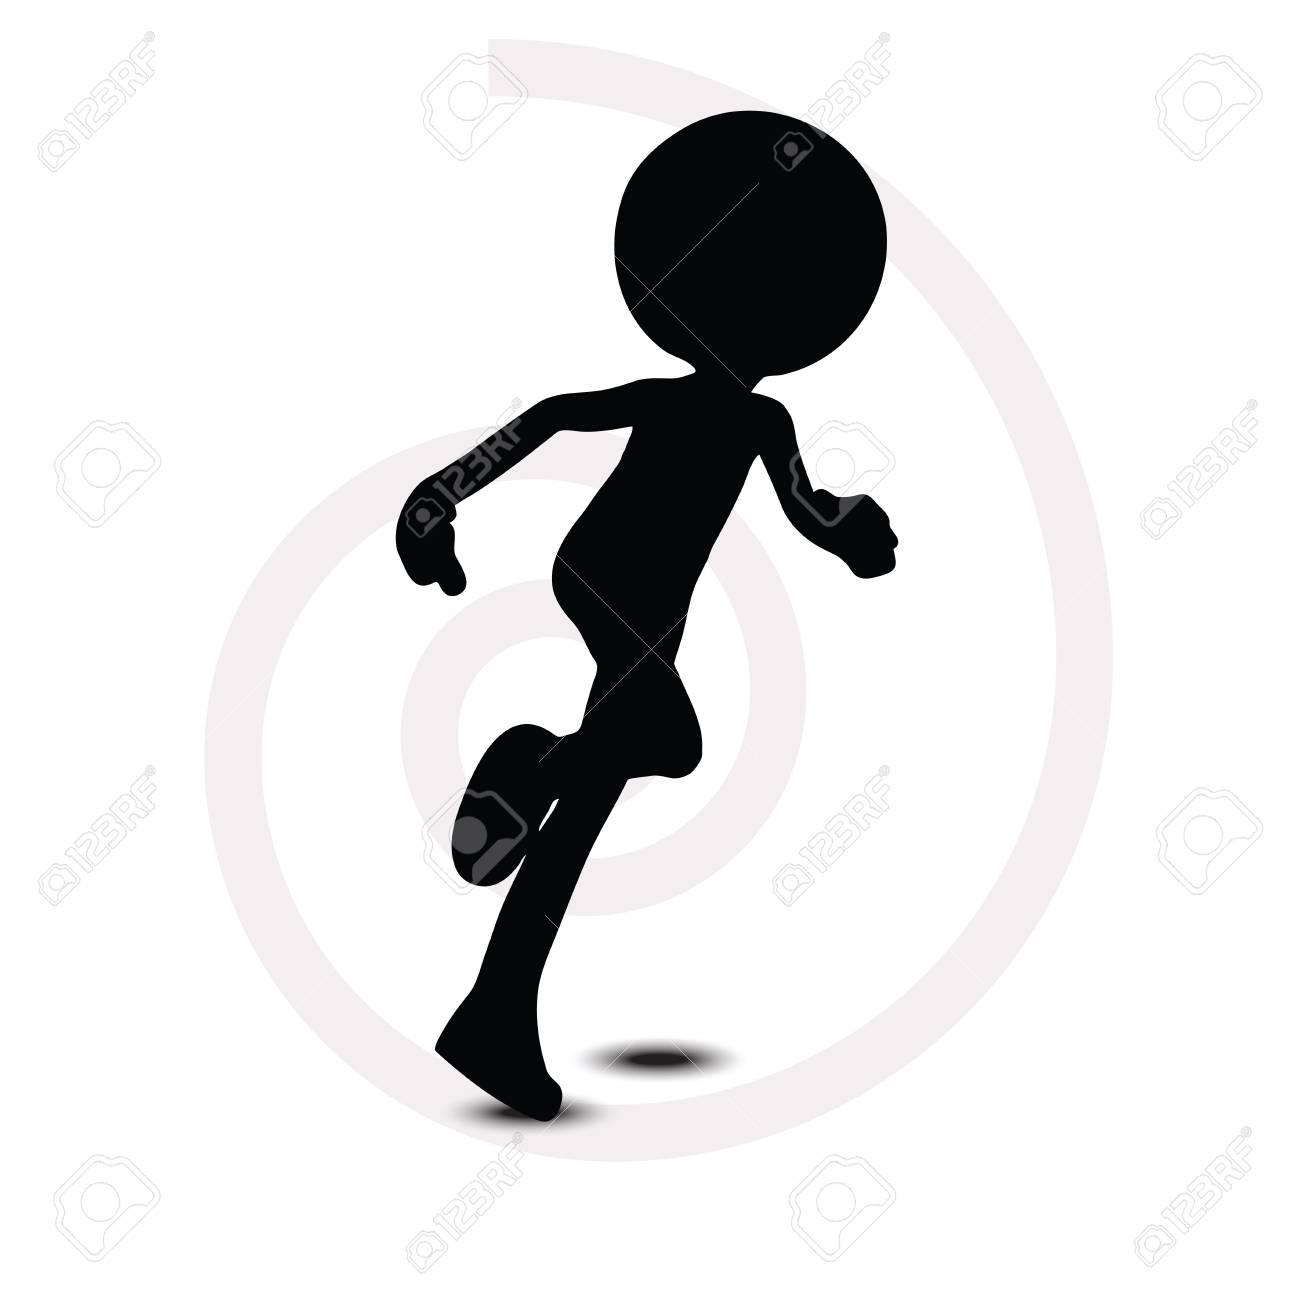 3d man in running pose Stock Vector - 29985069